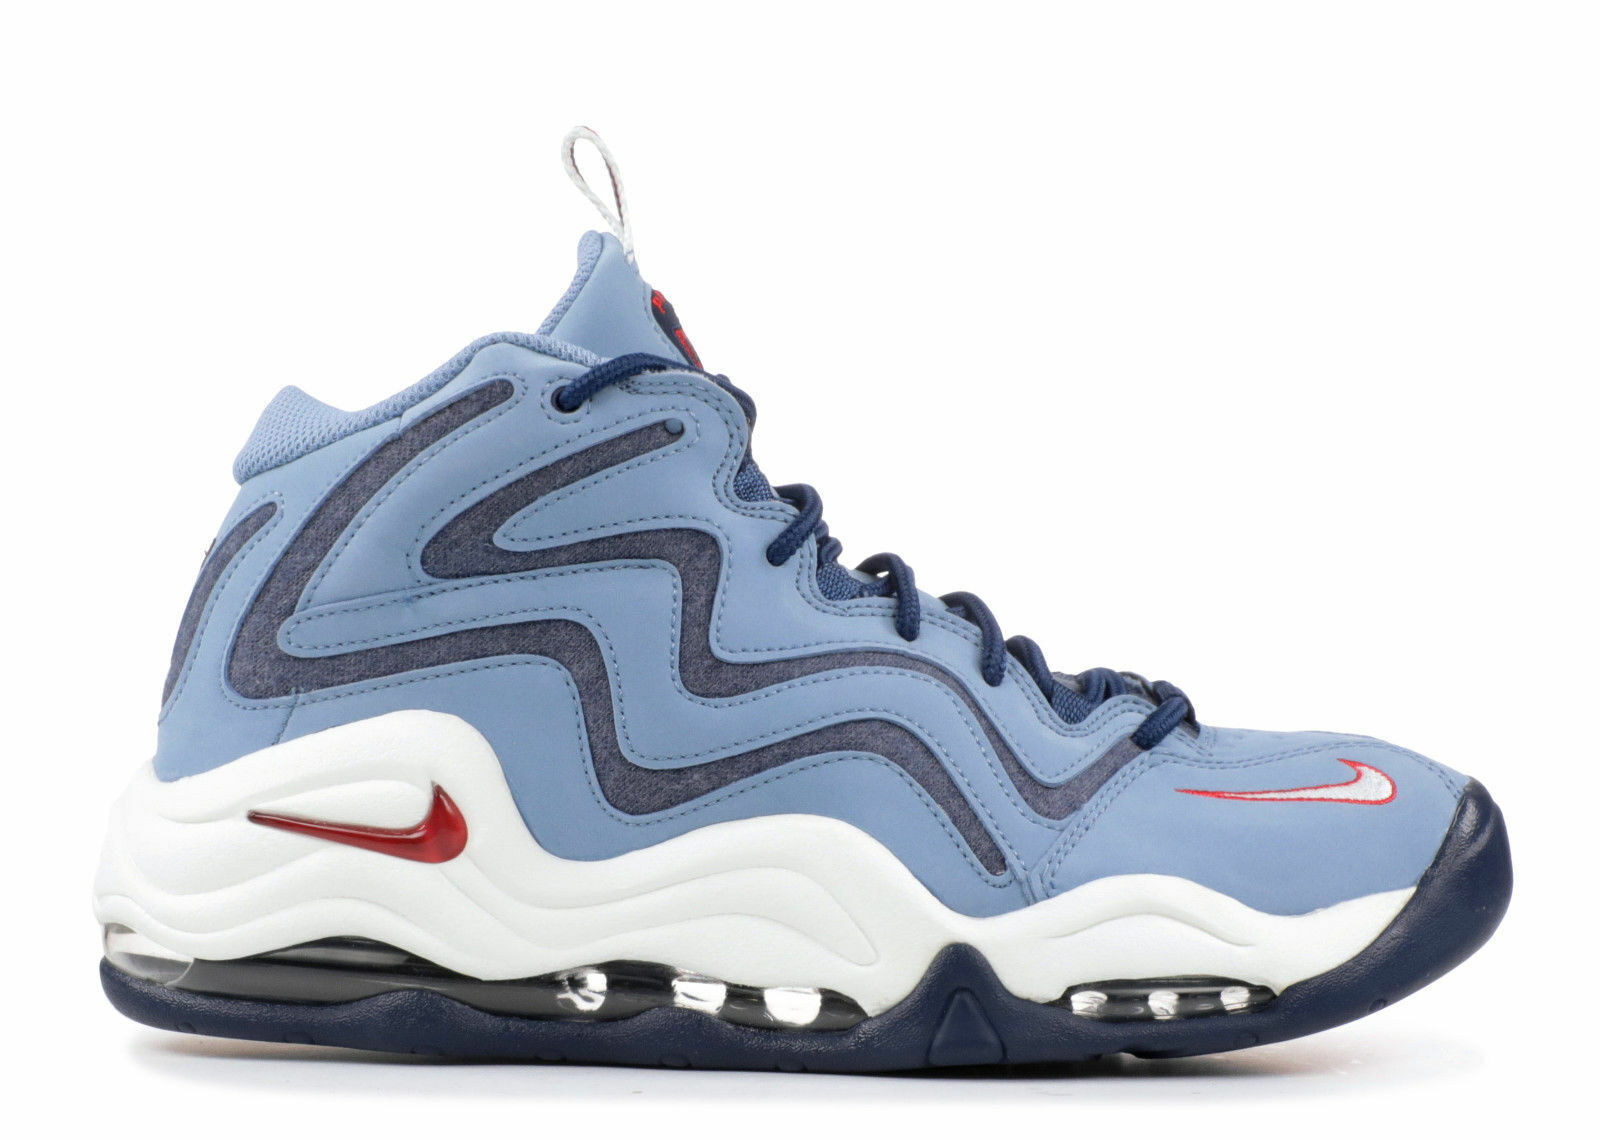 RARE 160 Men's 325001 403 bluee Work shoes Basketball Pippen